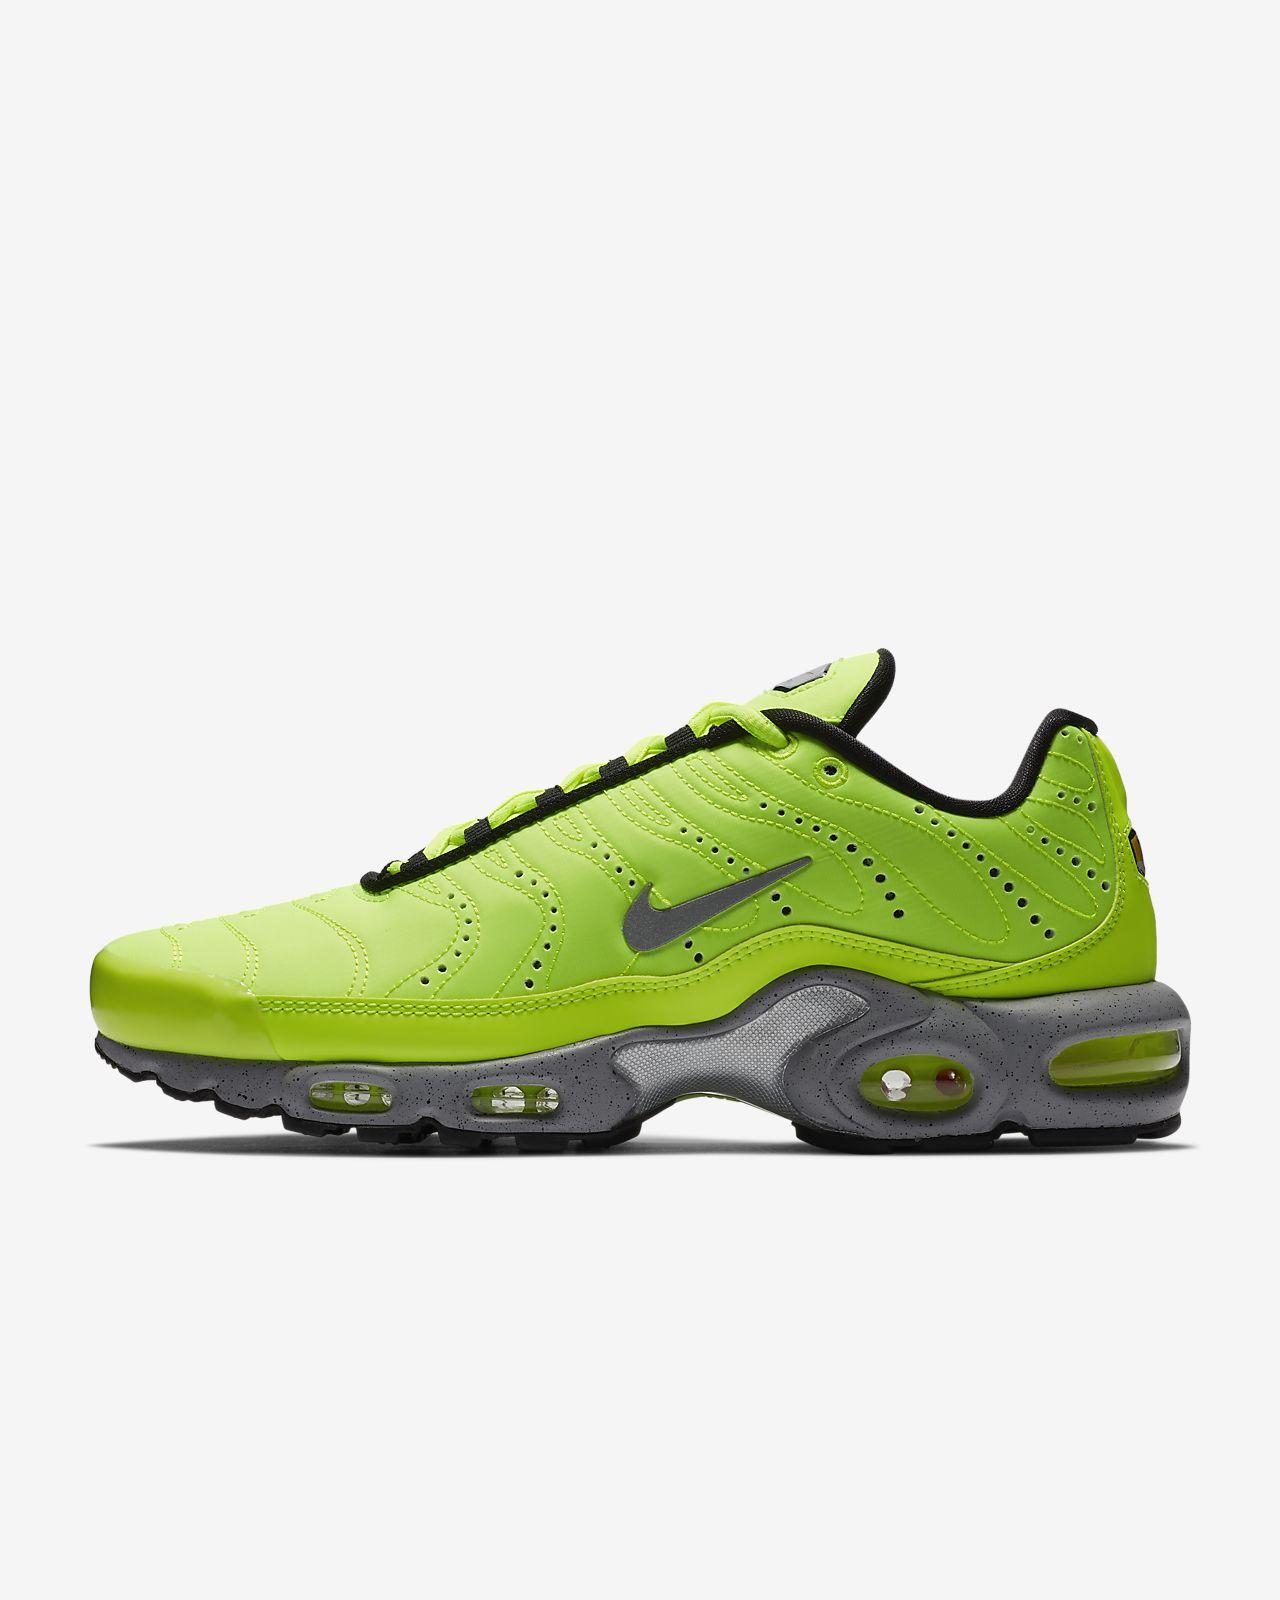 separation shoes 93f45 6140e ... Nike Air Max Plus Premium-sko til mænd